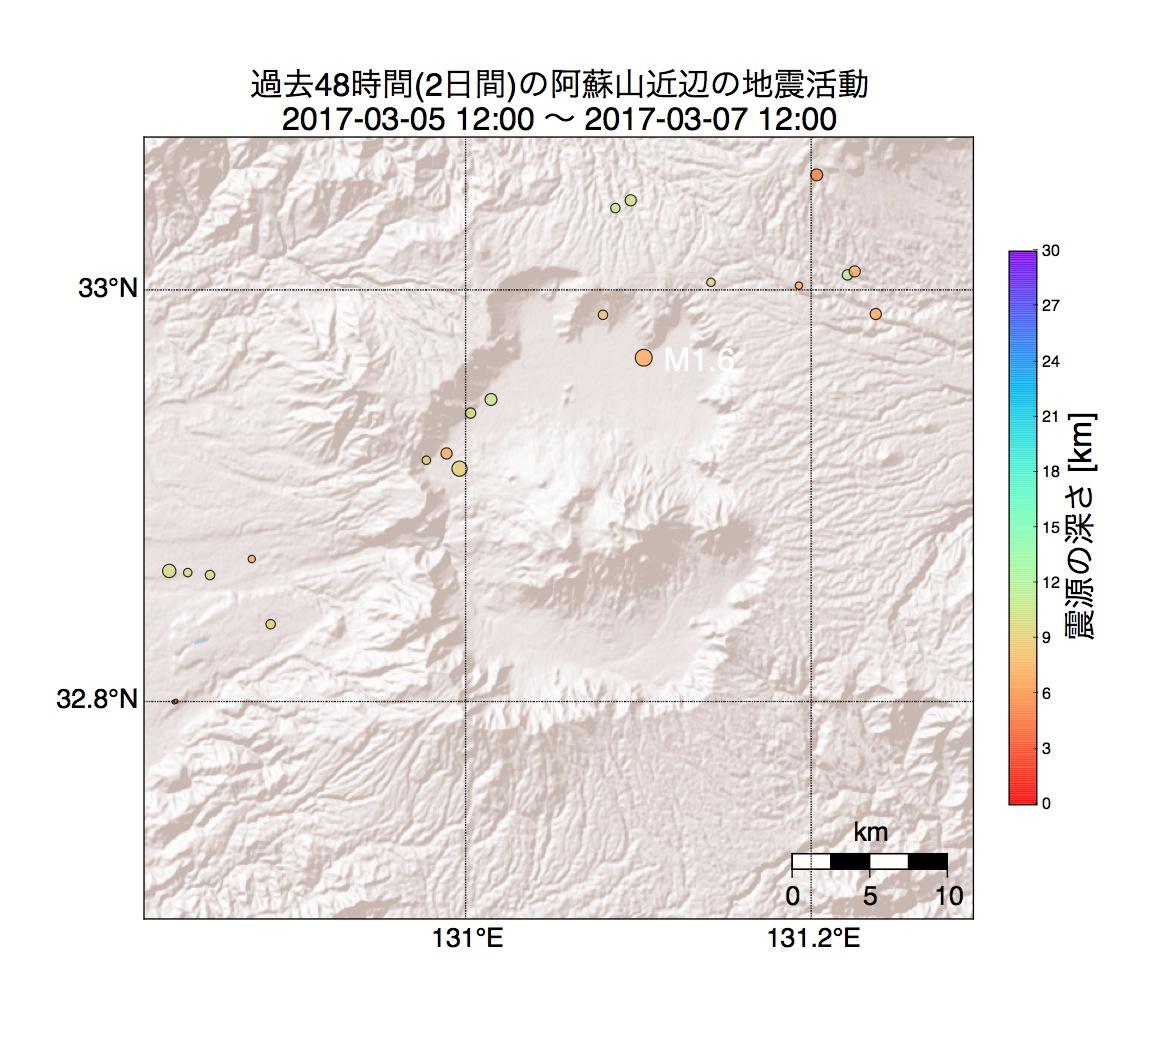 http://jishin.chamu.org/aso/20170307_1.jpg